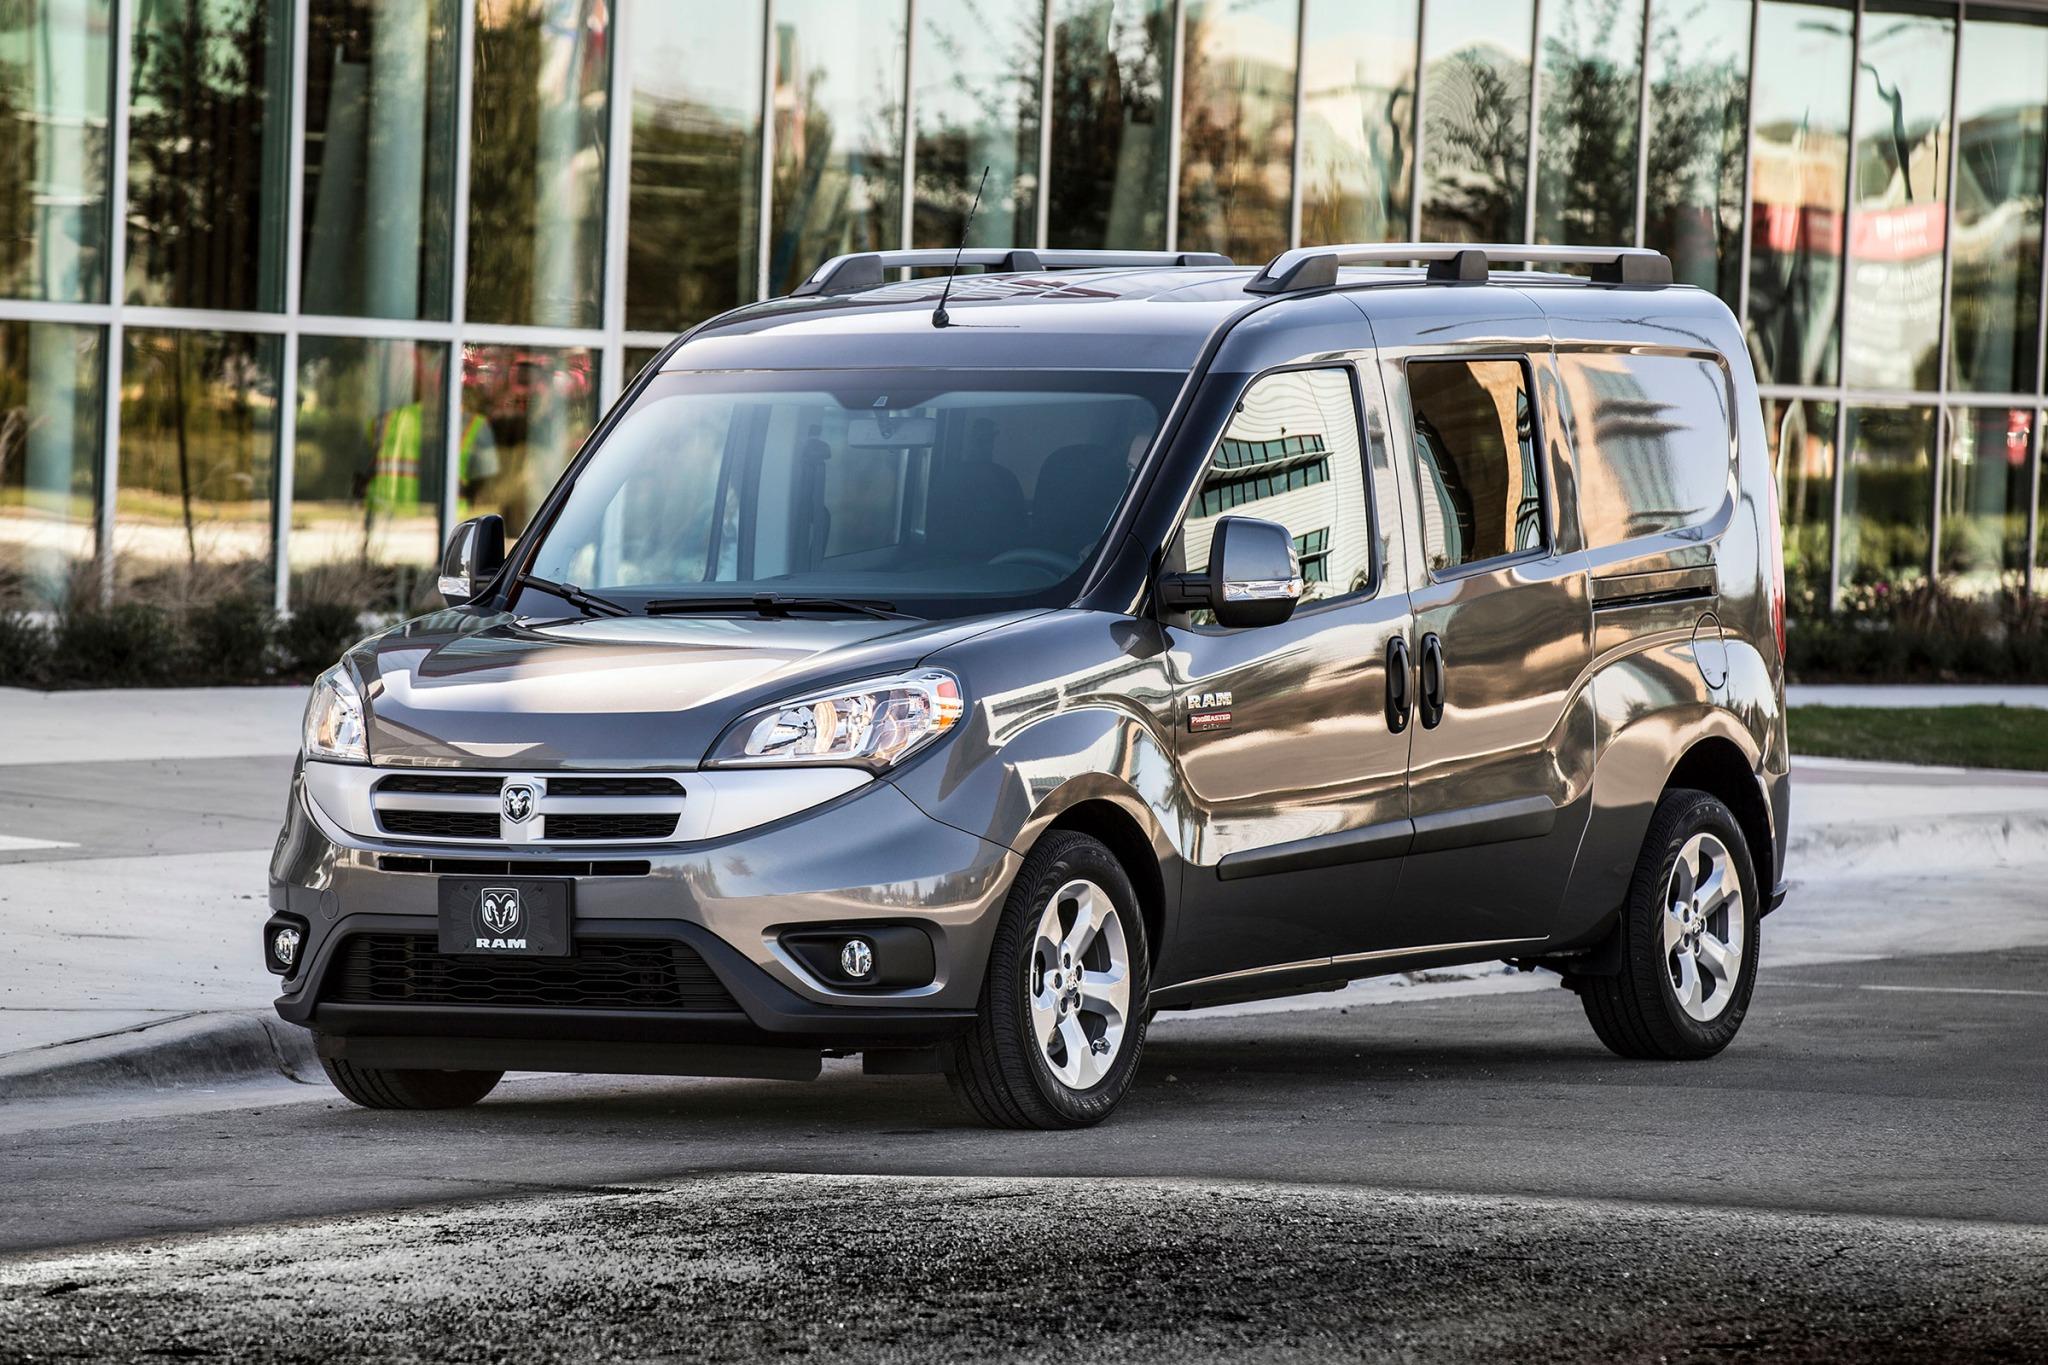 2018 ram promaster city passenger minivan wagon slt fq oem 1 2048